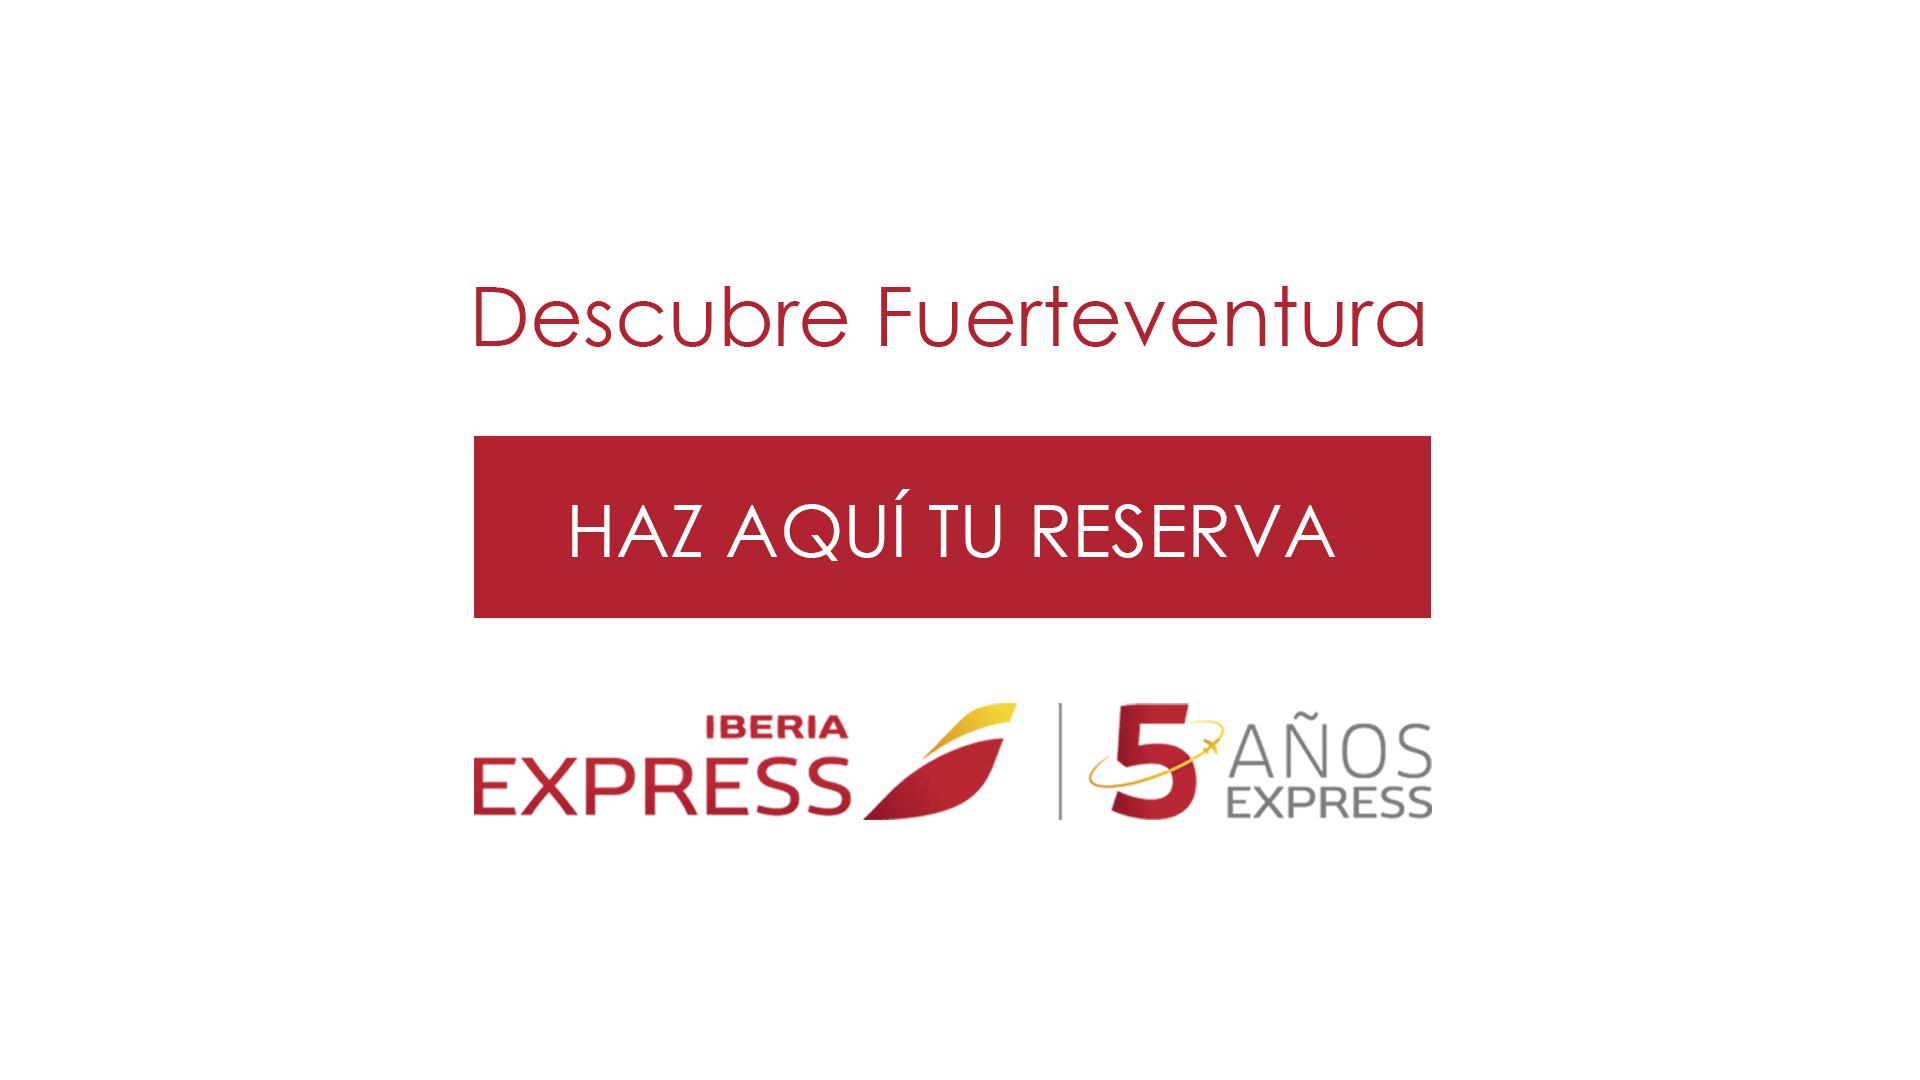 iberia express vuelos fuerteventura